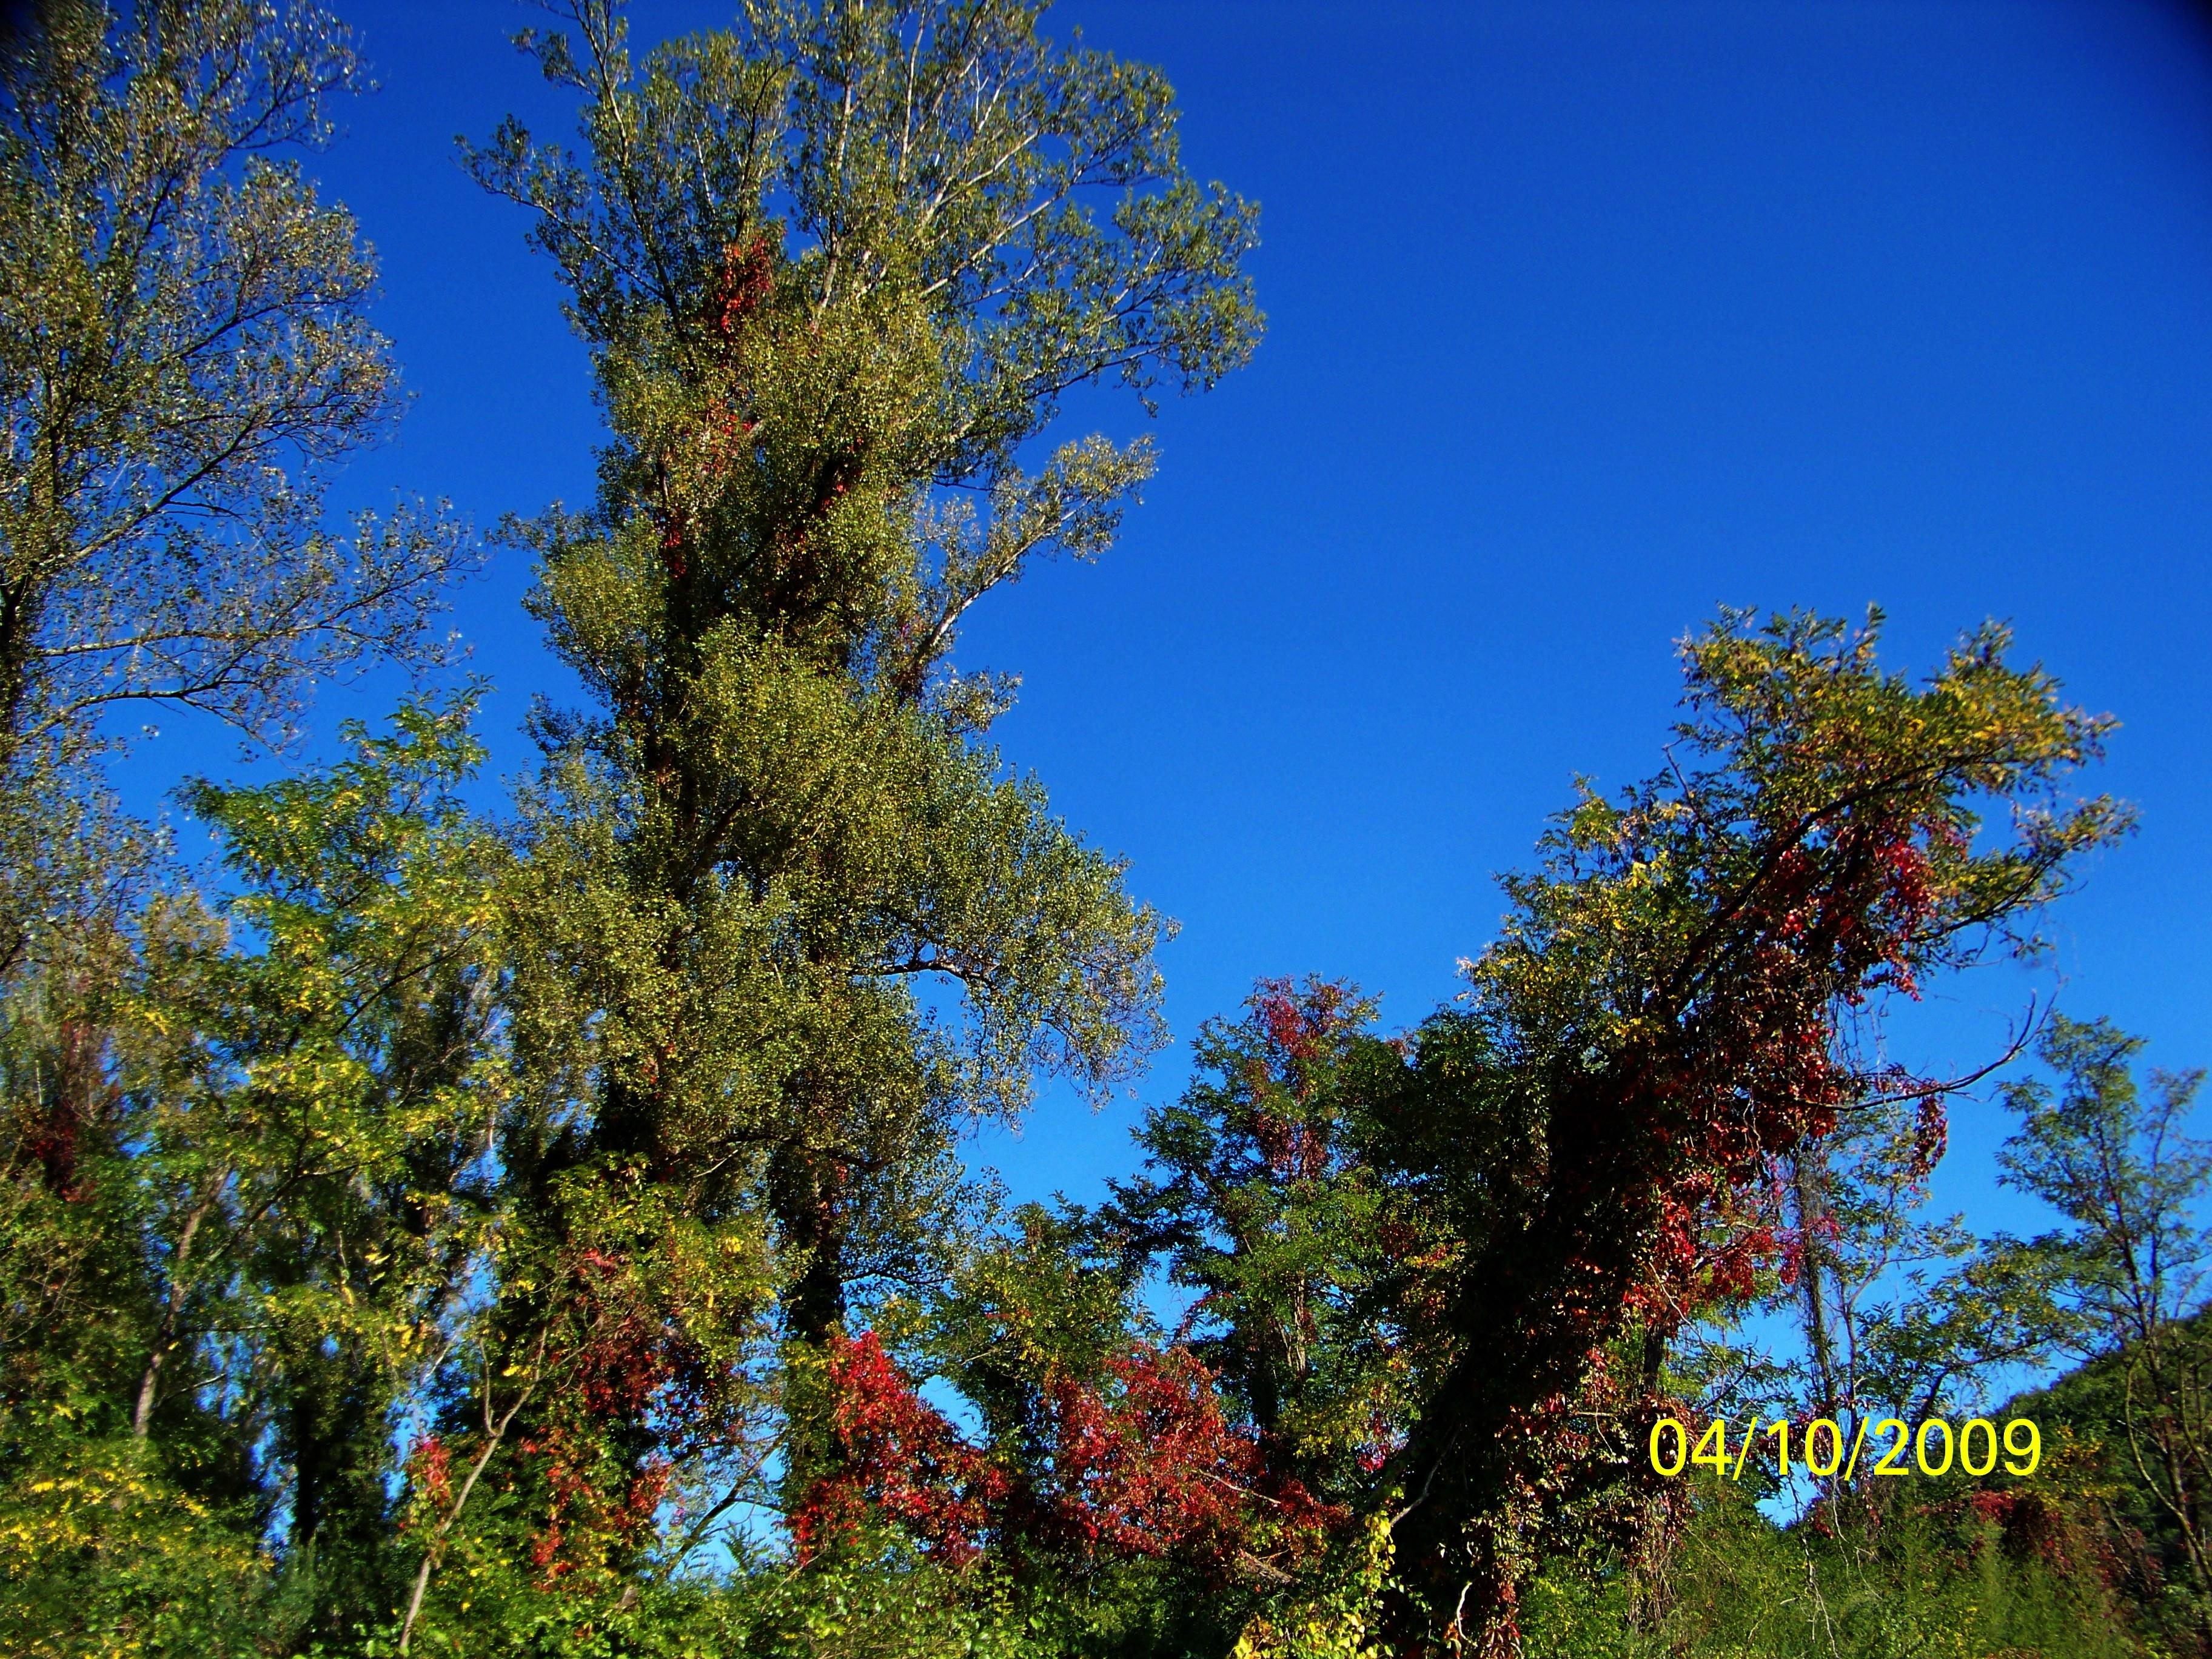 T l charger fonds d 39 cran l 39 automne met ses couleurs gratuitement - L automne et ses couleurs ...